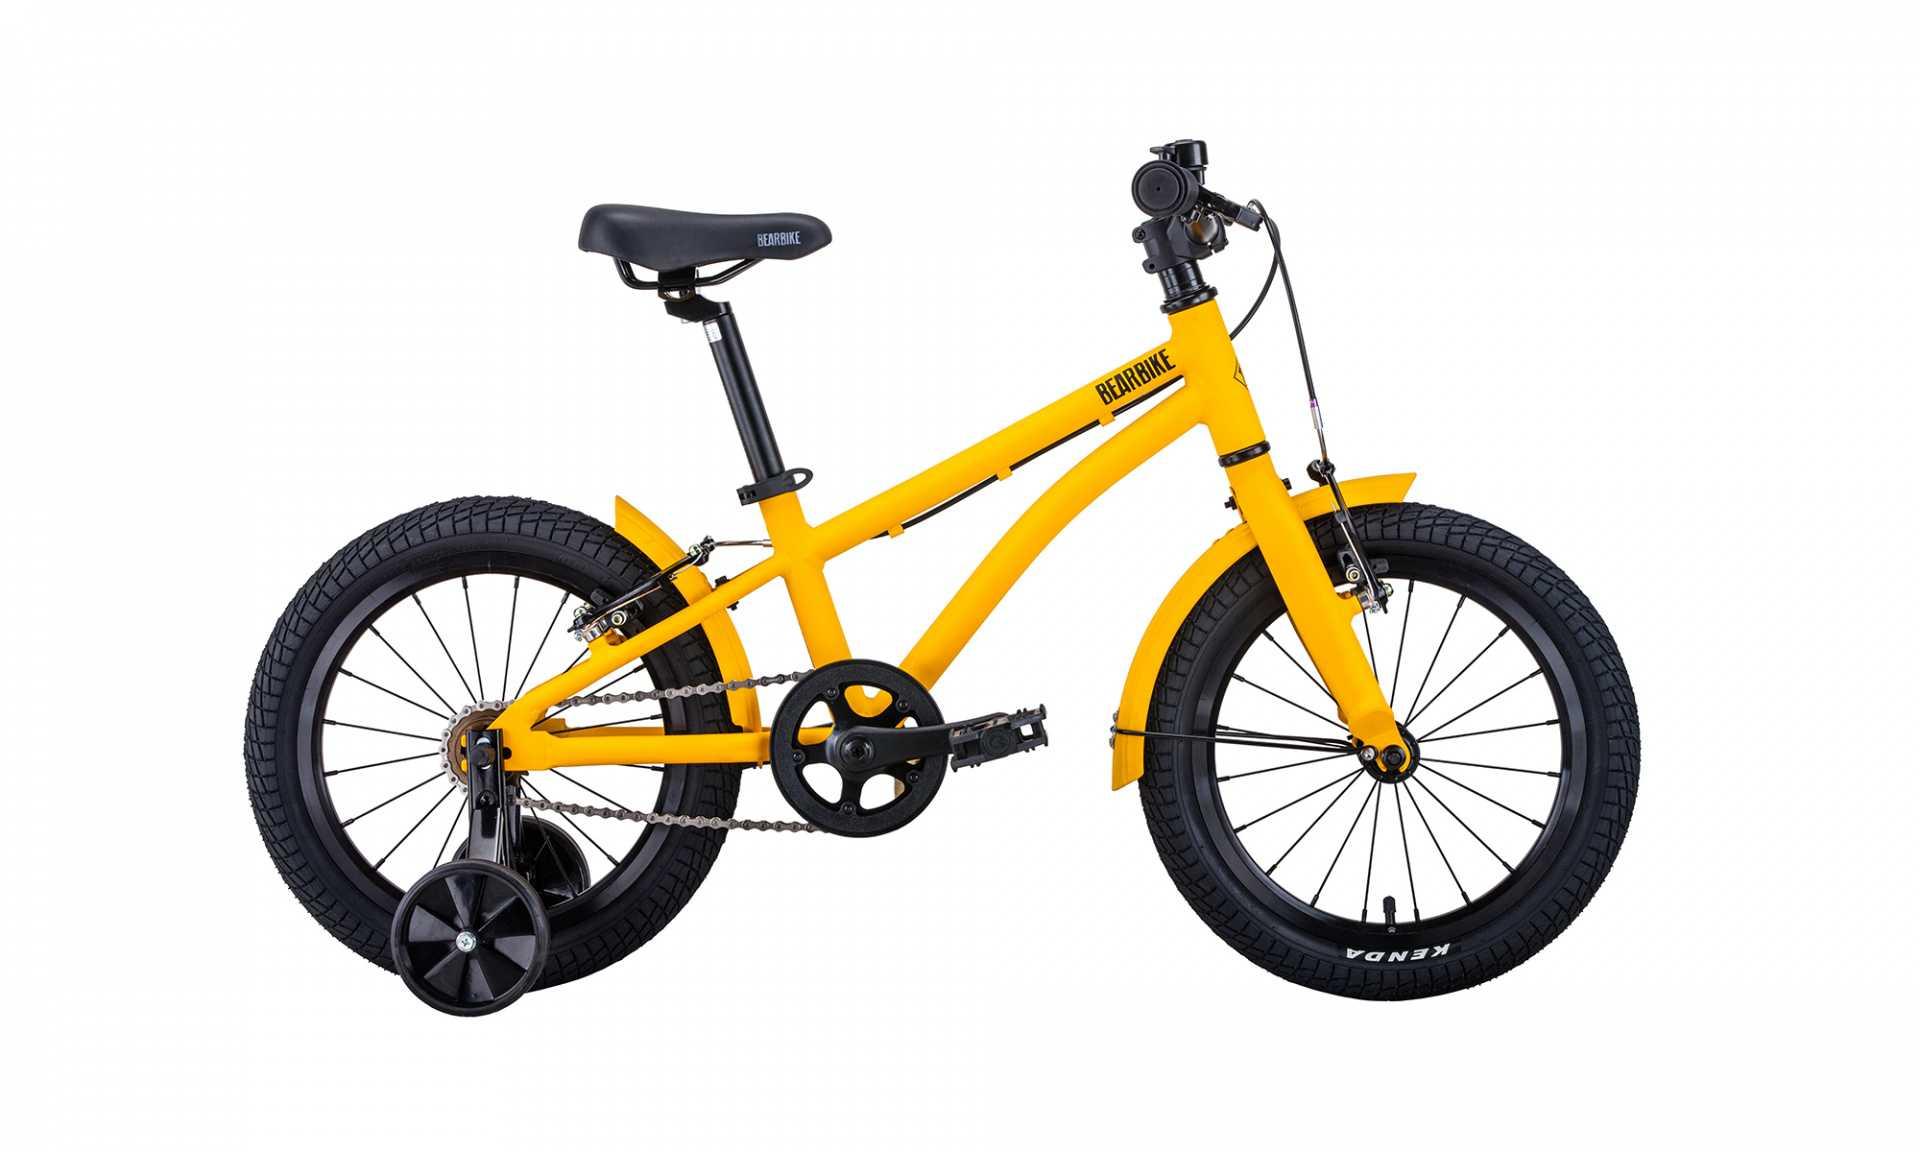 Kitez 16 (рост OS) 2019-2020, желтый, RBKB0Y6G1003